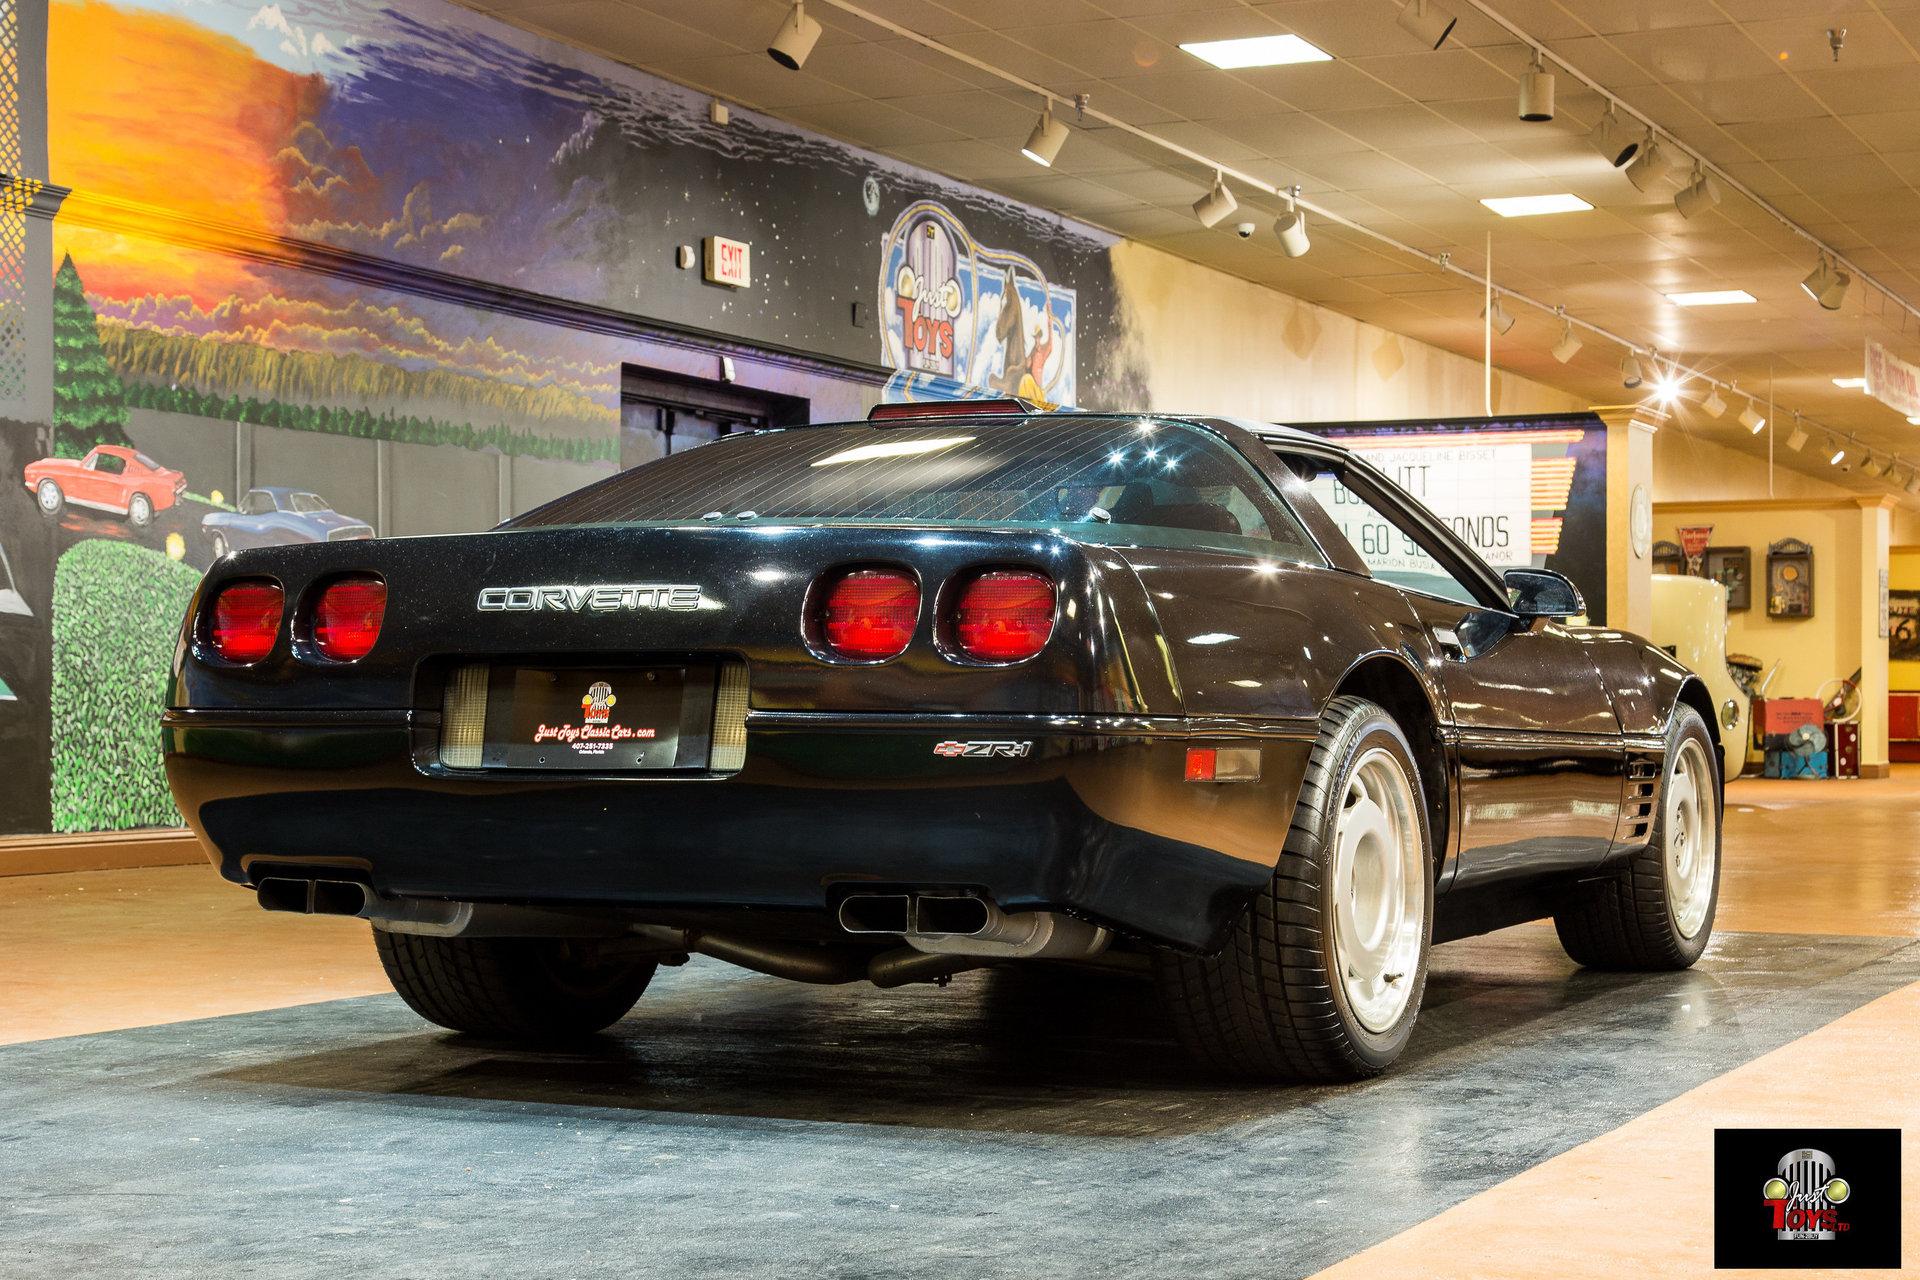 1991 Chevrolet Corvette ZR1 for sale